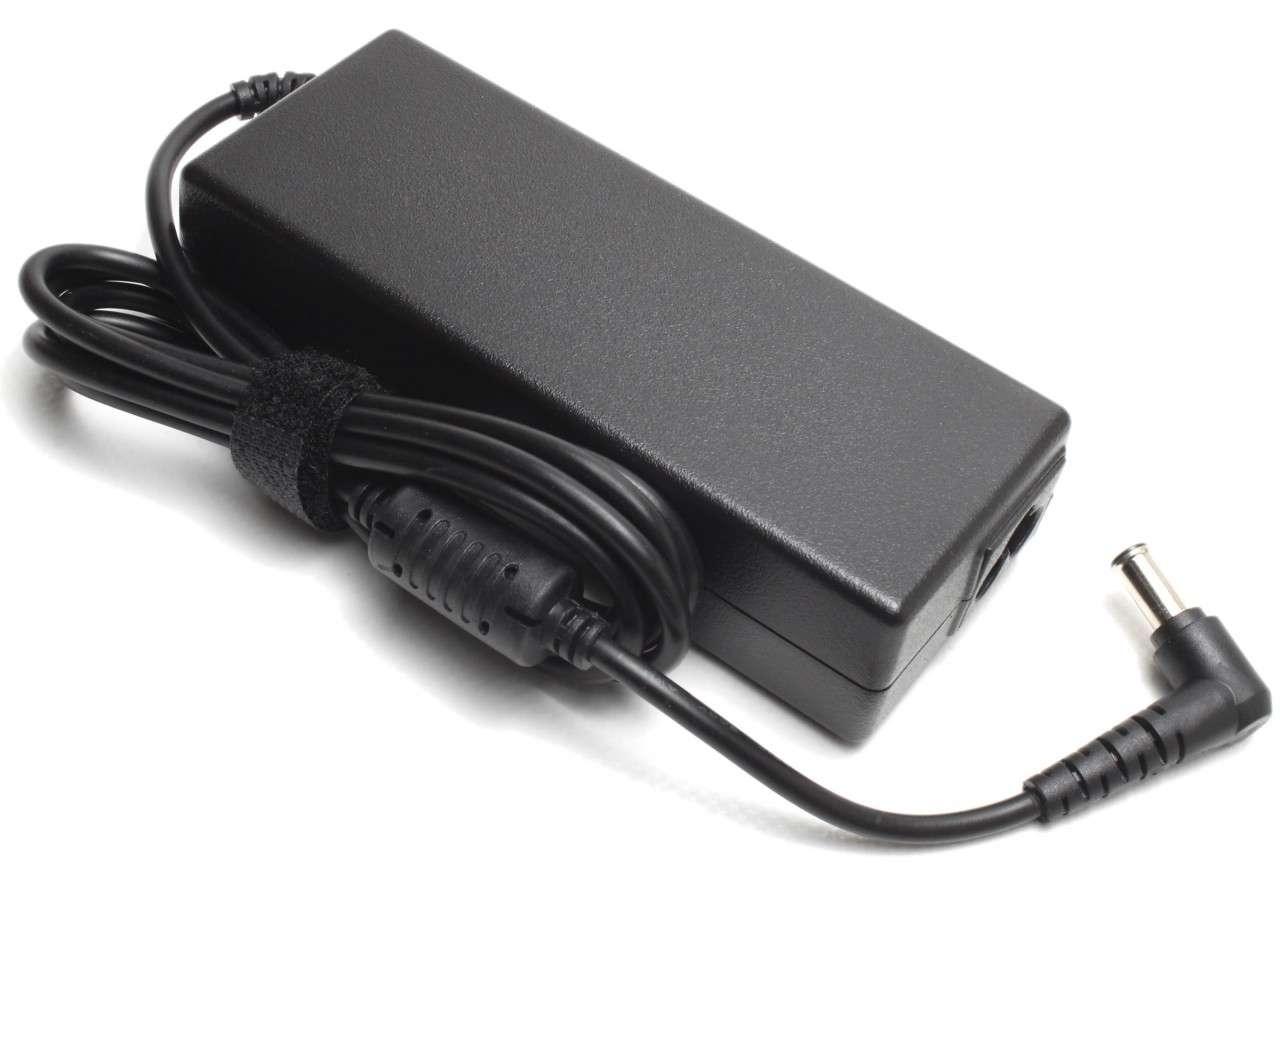 Incarcator Sony Vaio VGN FW44 Replacement imagine powerlaptop.ro 2021